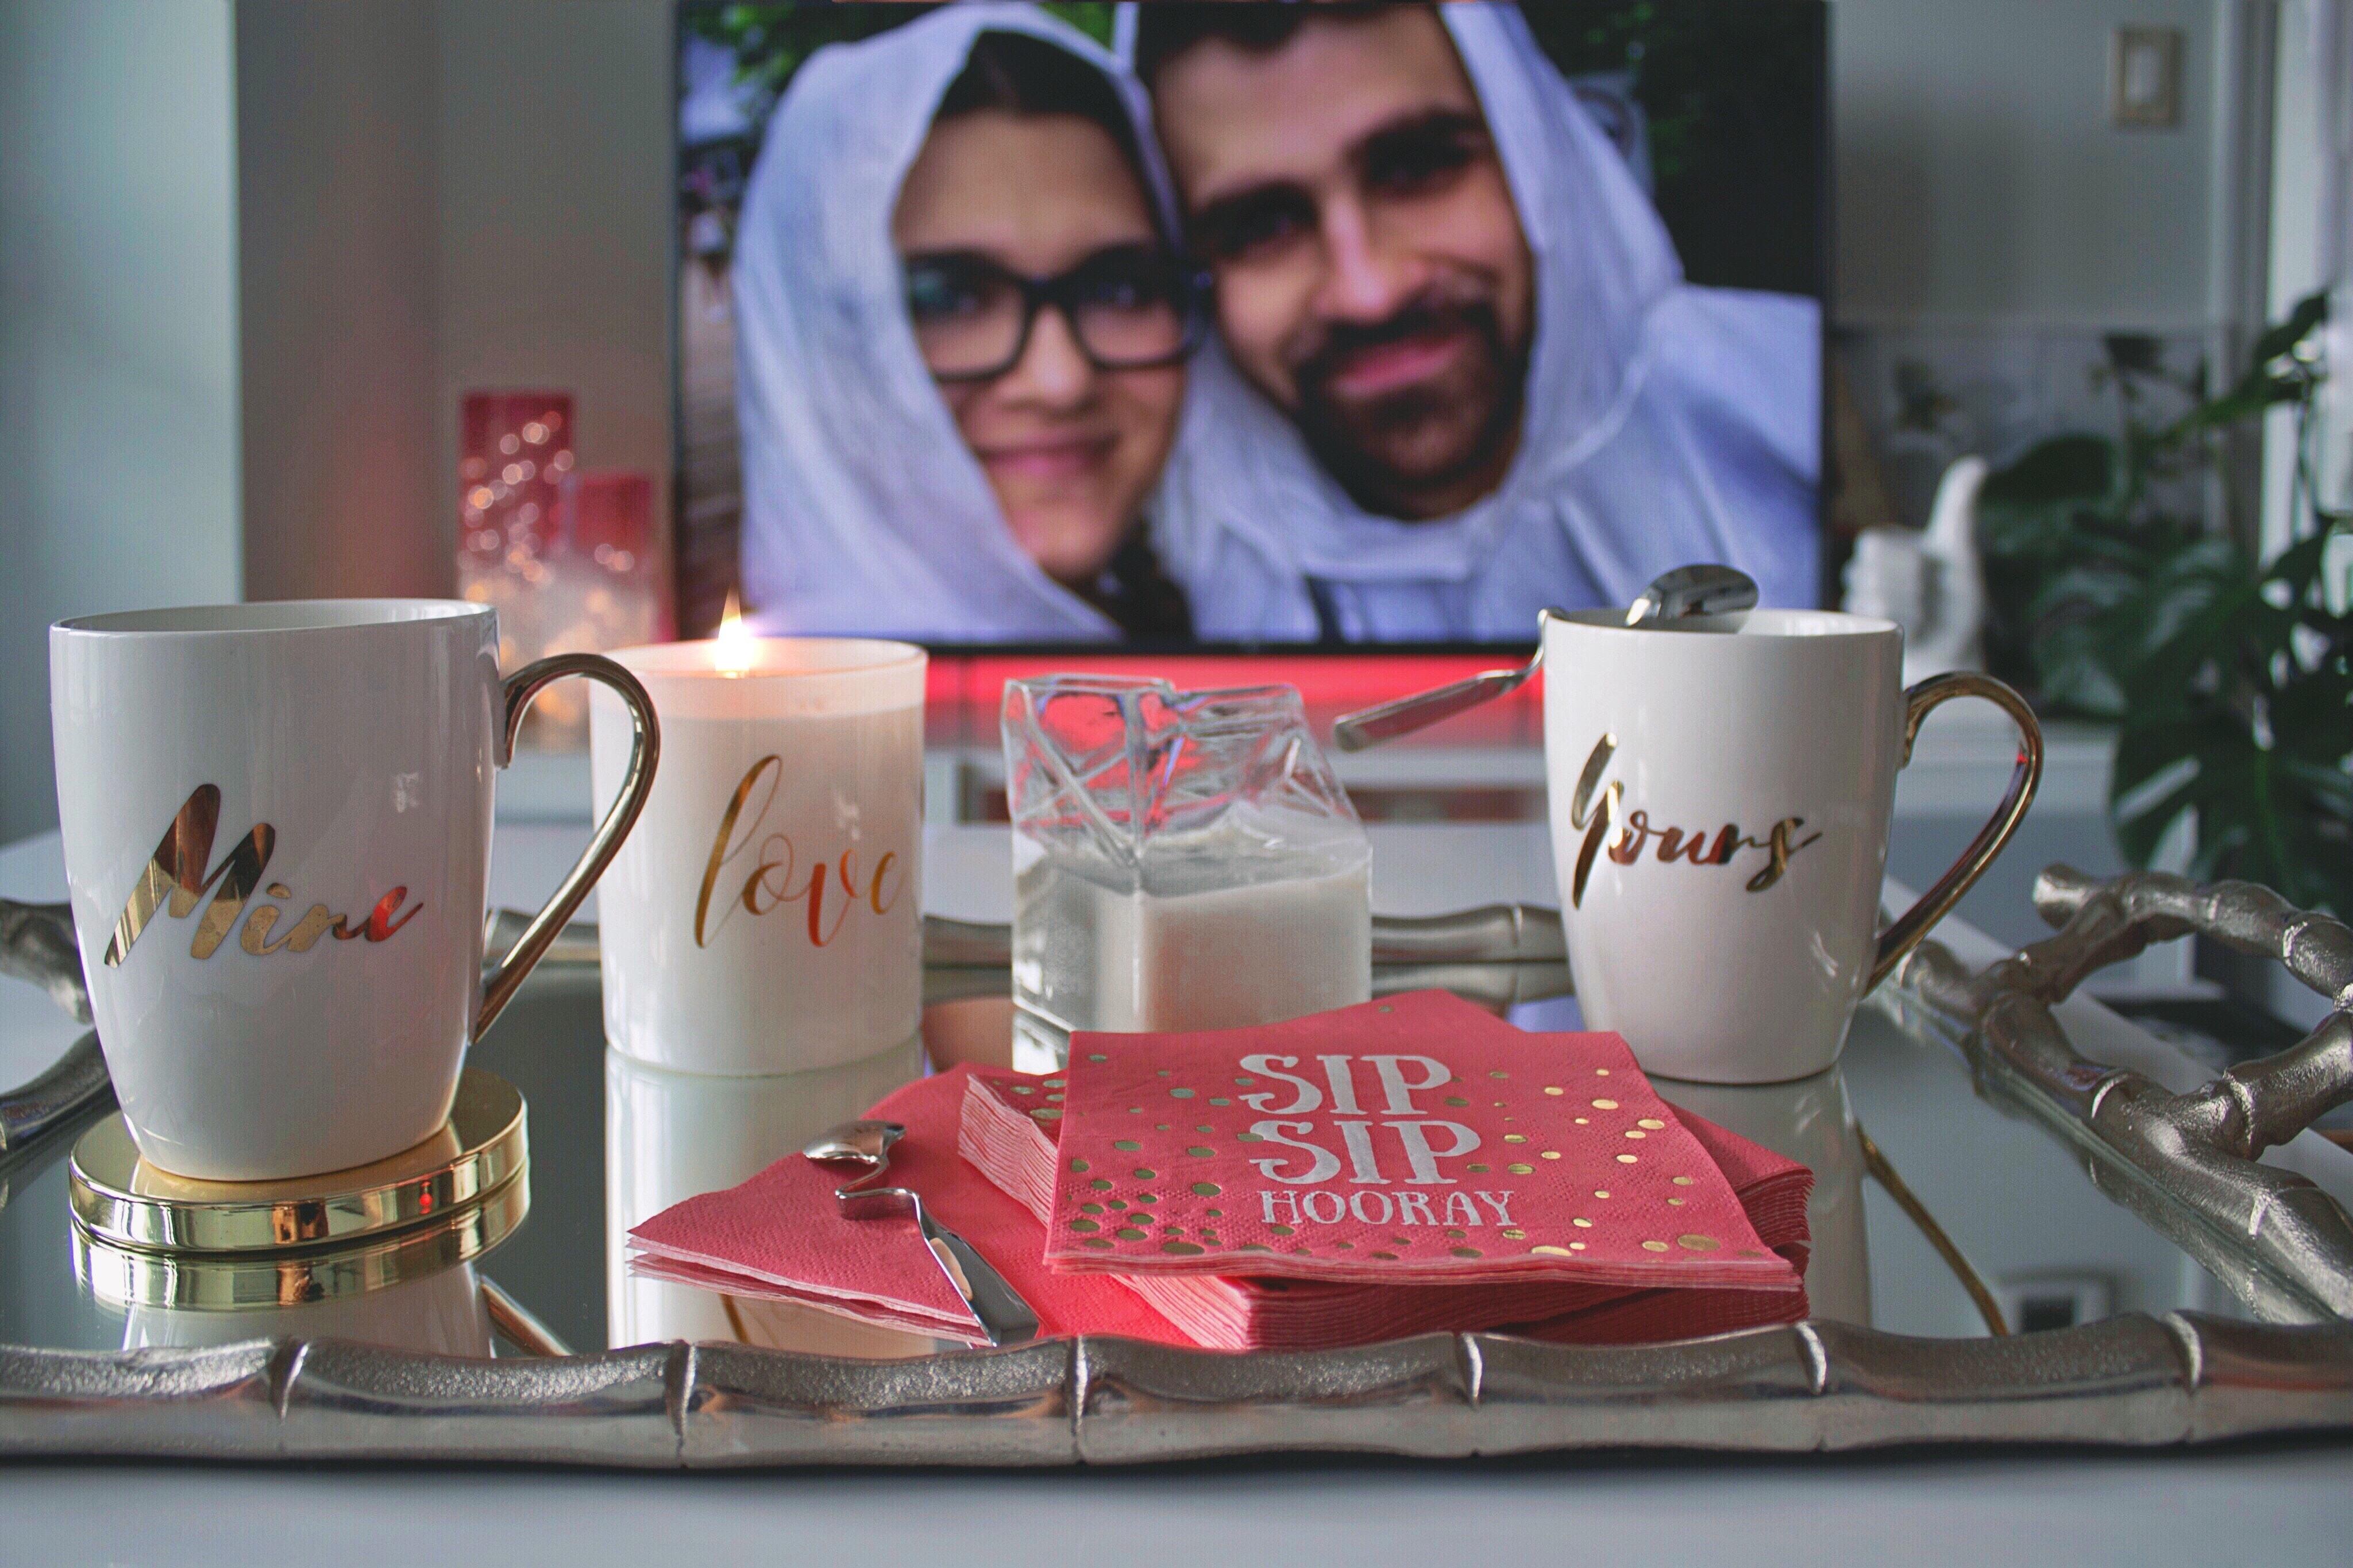 White Ceramic Mugs, Breakfast, Focus, Wife, Tray, HQ Photo